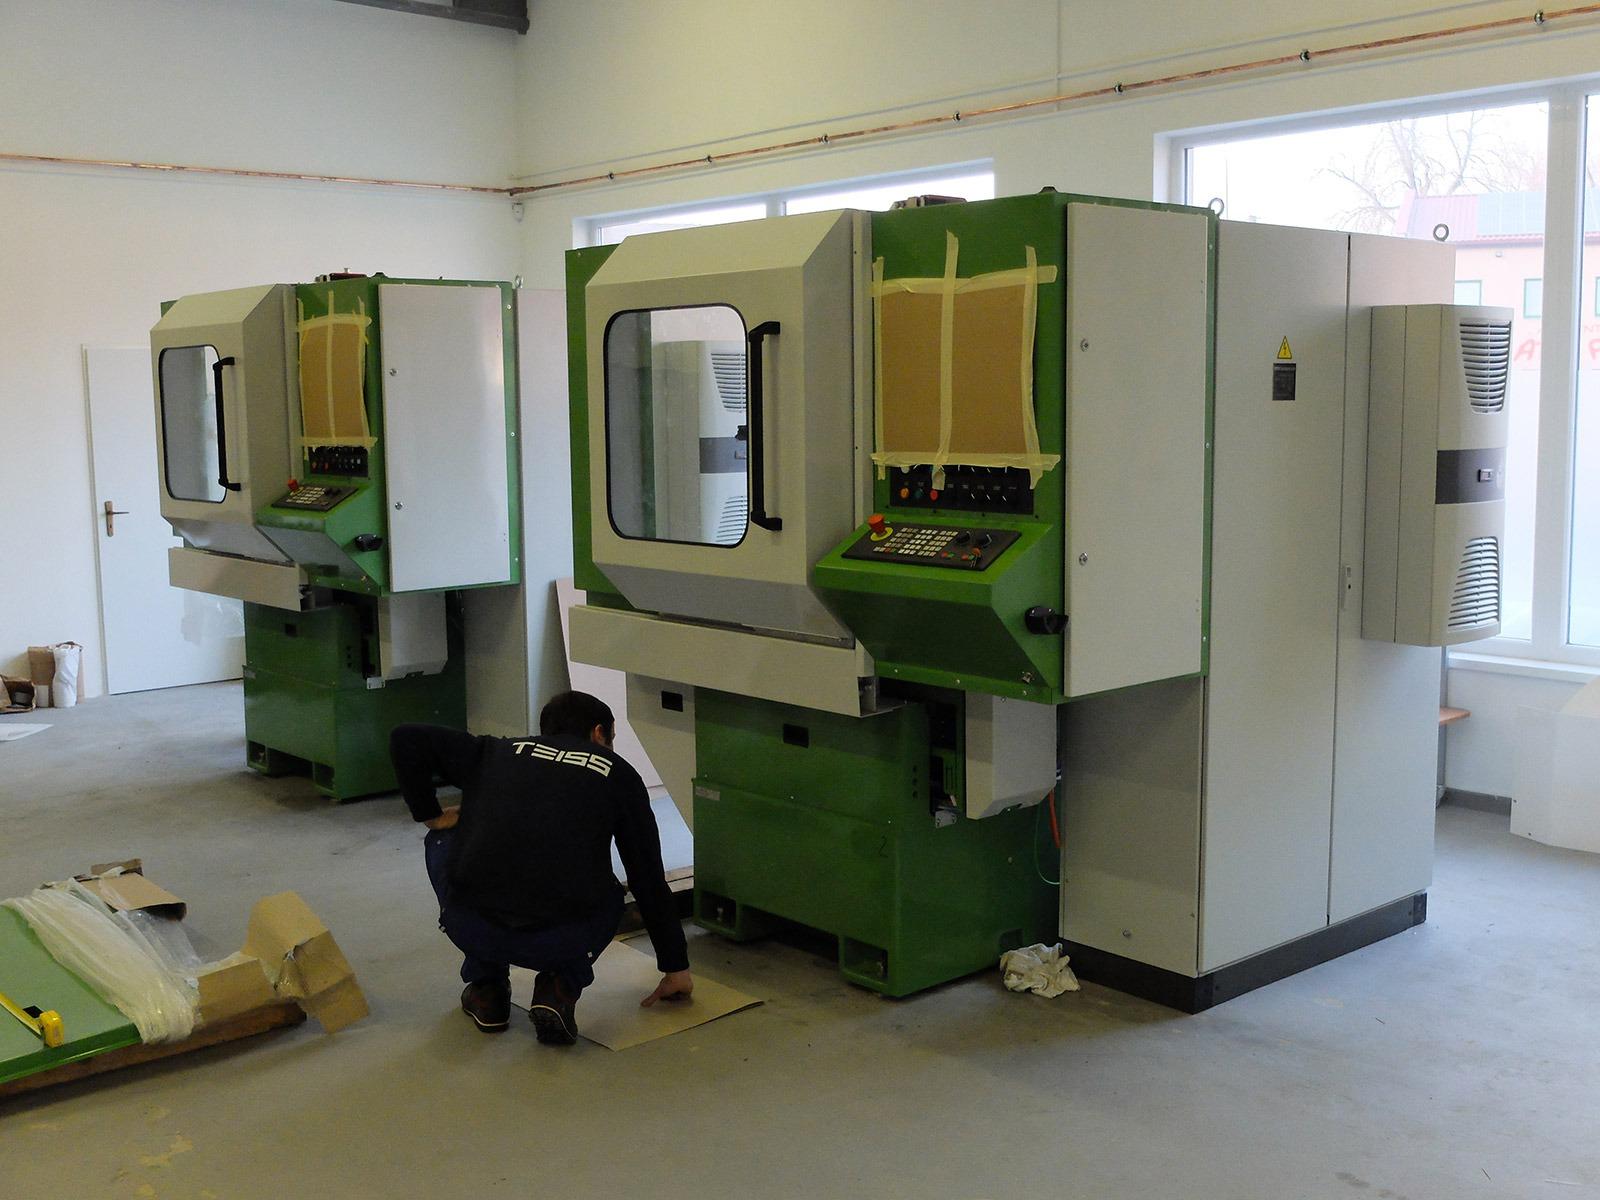 Teiss – Výroba průmyslových strojů na míru